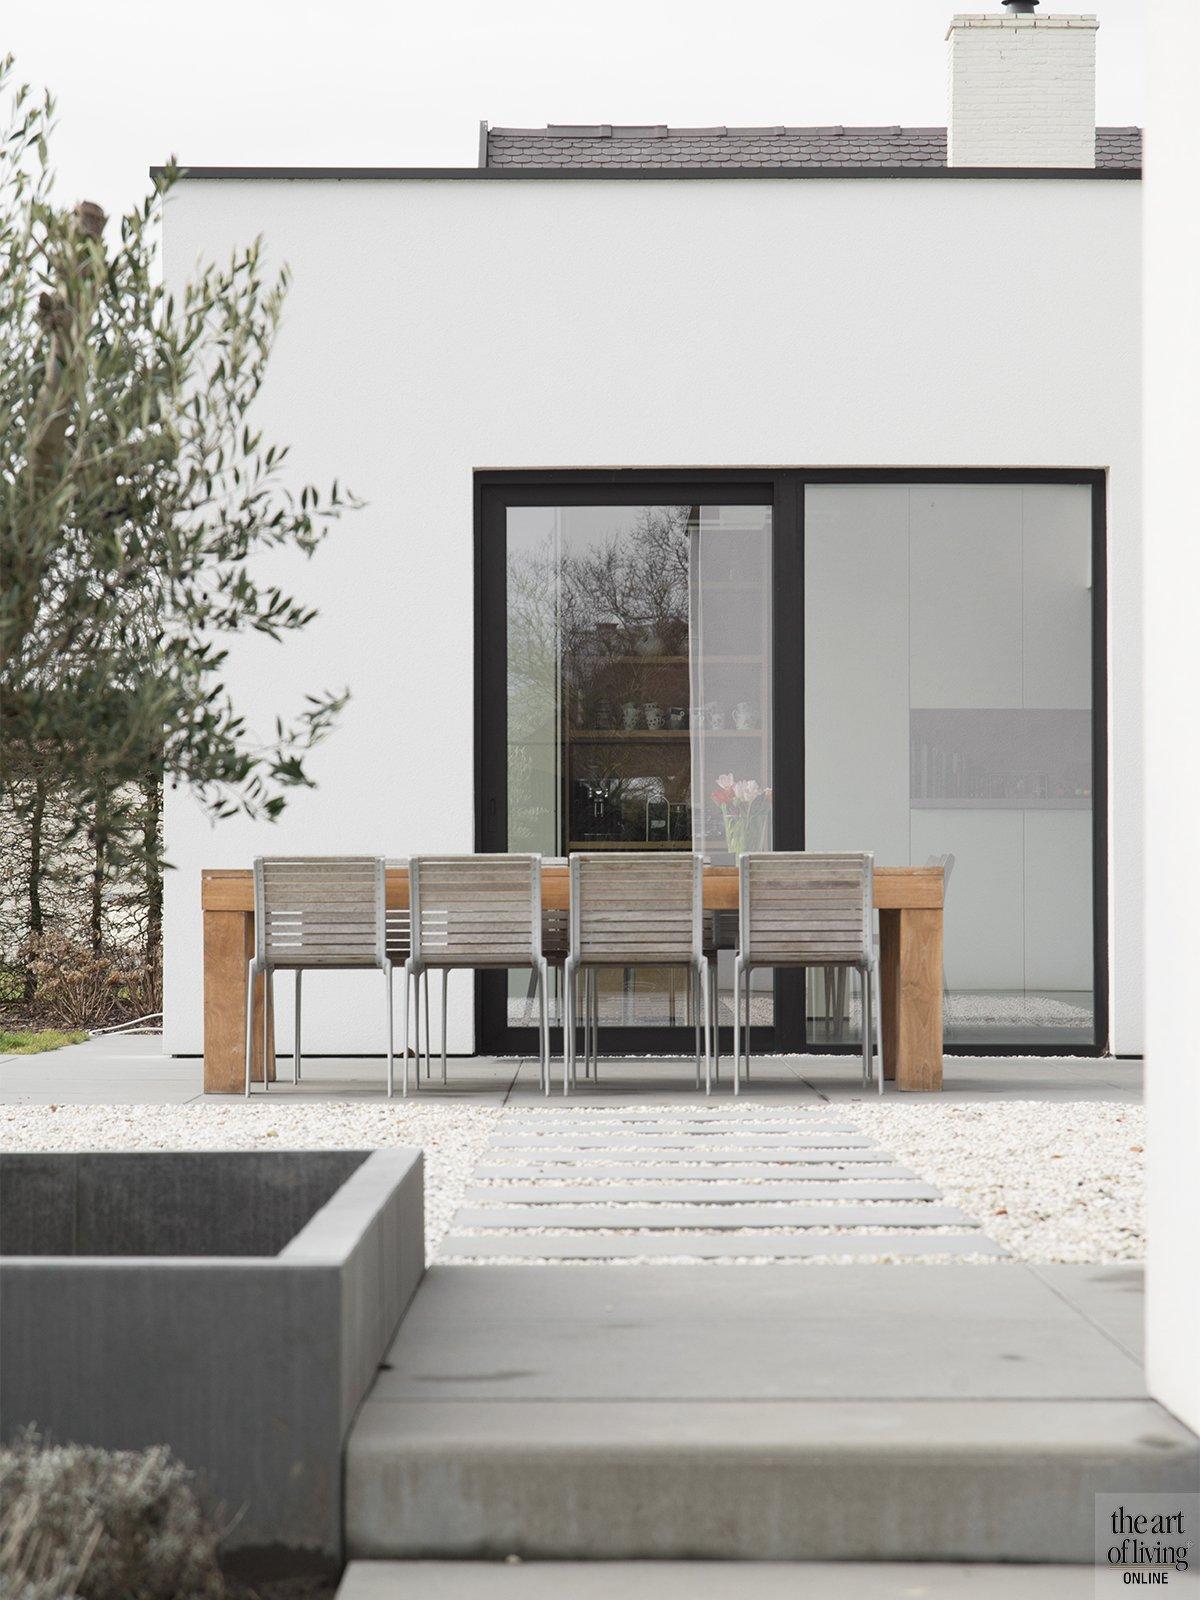 Tijdloos wonen, Kris van den Broeck, Modern interieur, Wit interieur, Strak Interieur, Exterieur, Terras, Tuinmeubelen, Design meubels, Architectuur